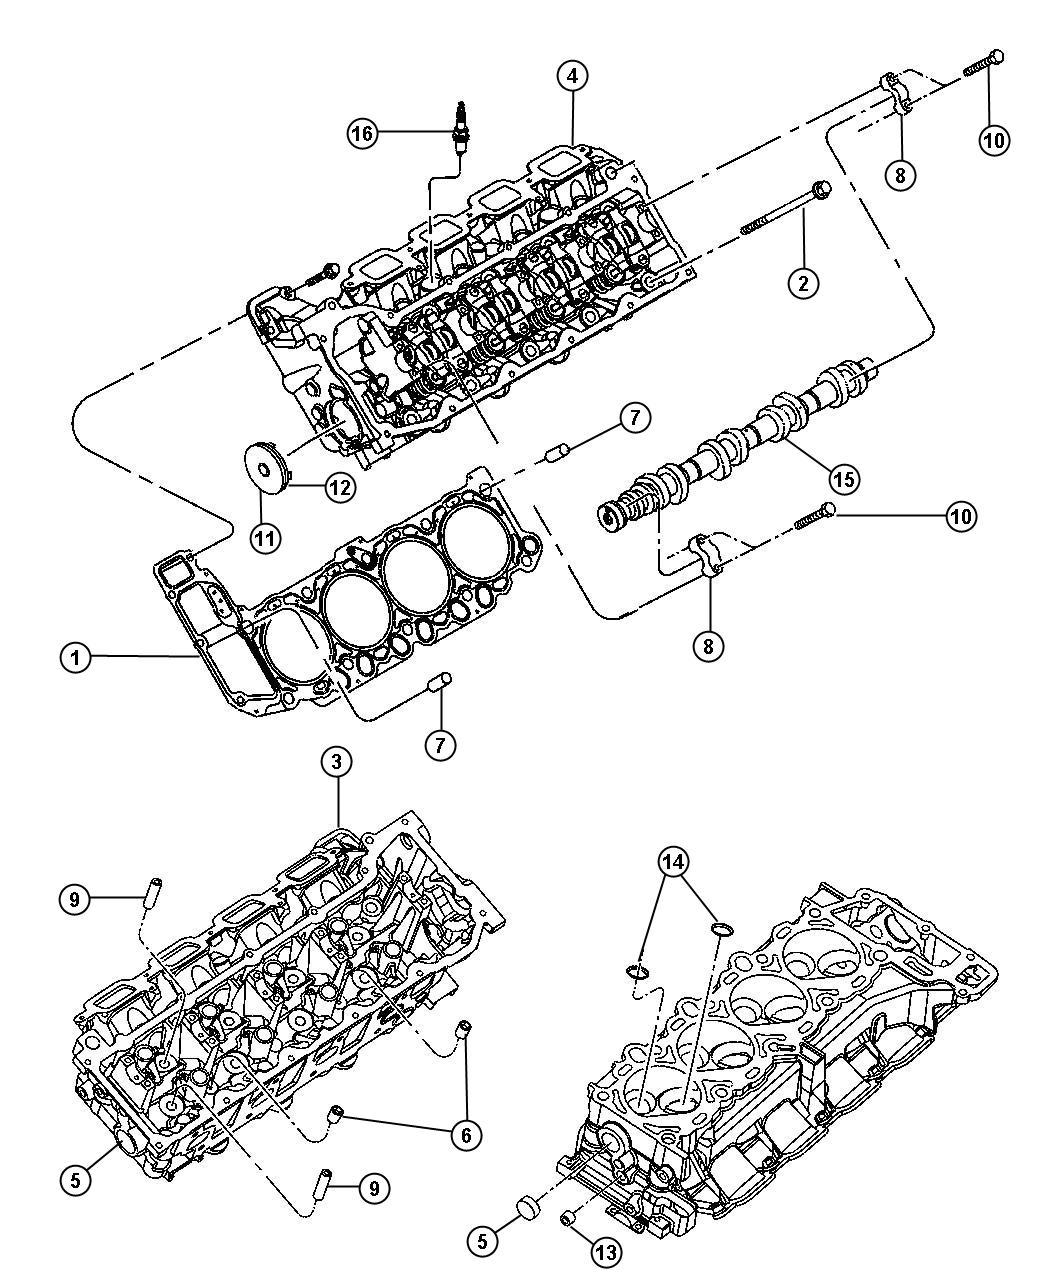 2009 Dodge Durango Spark plug. Intake. Side. See group 8